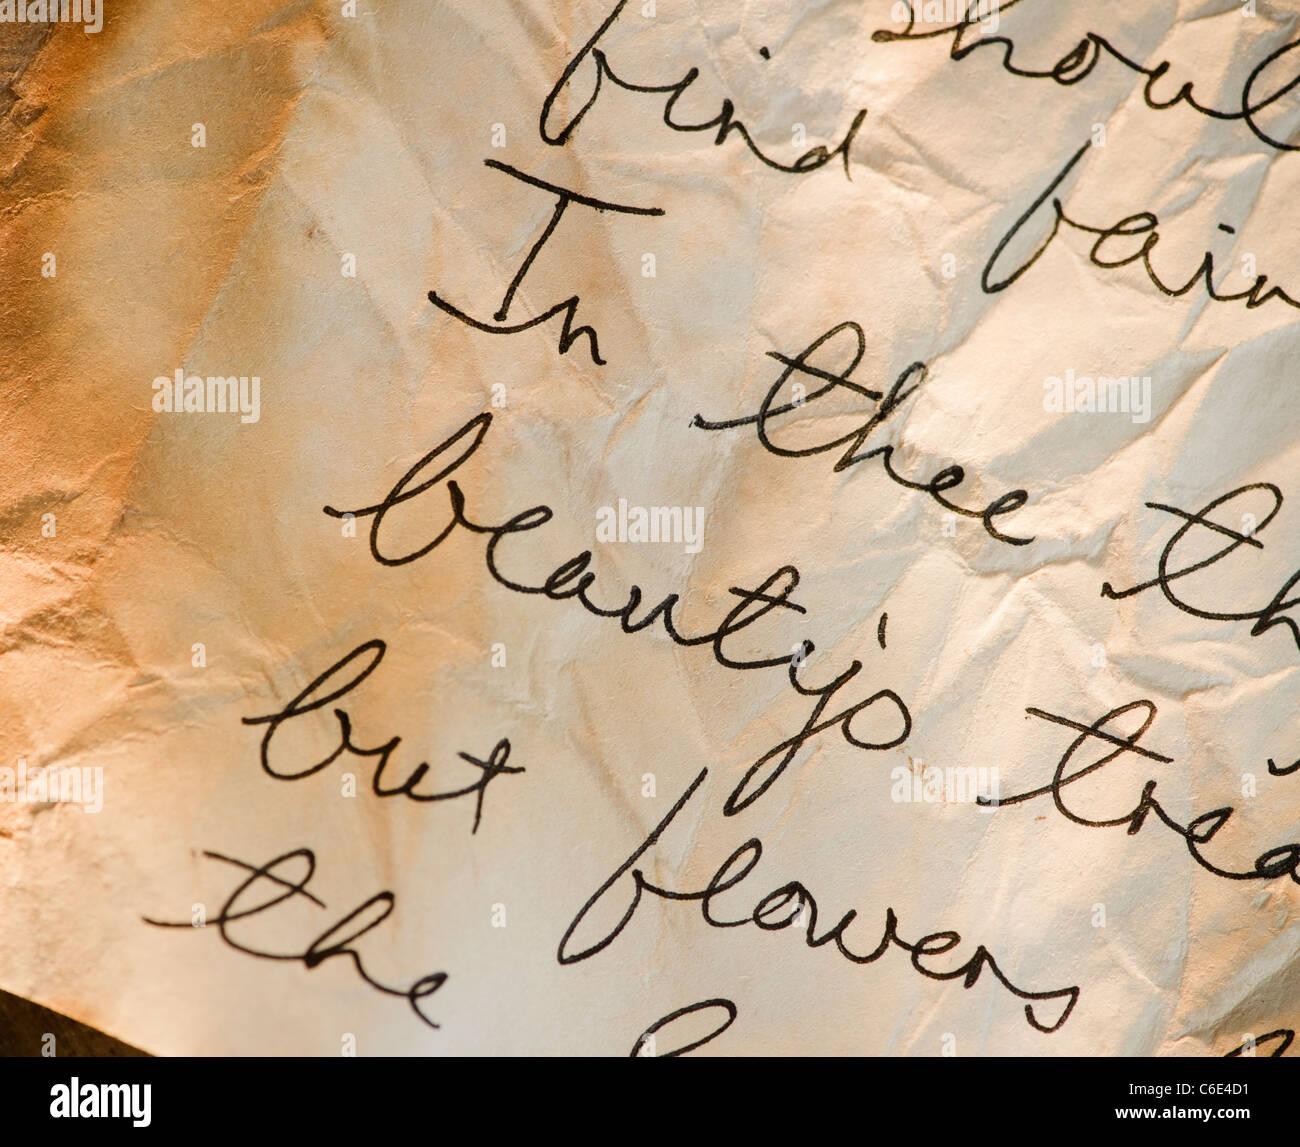 Cerca de la antigua carta de amor sobre pergamino Imagen De Stock